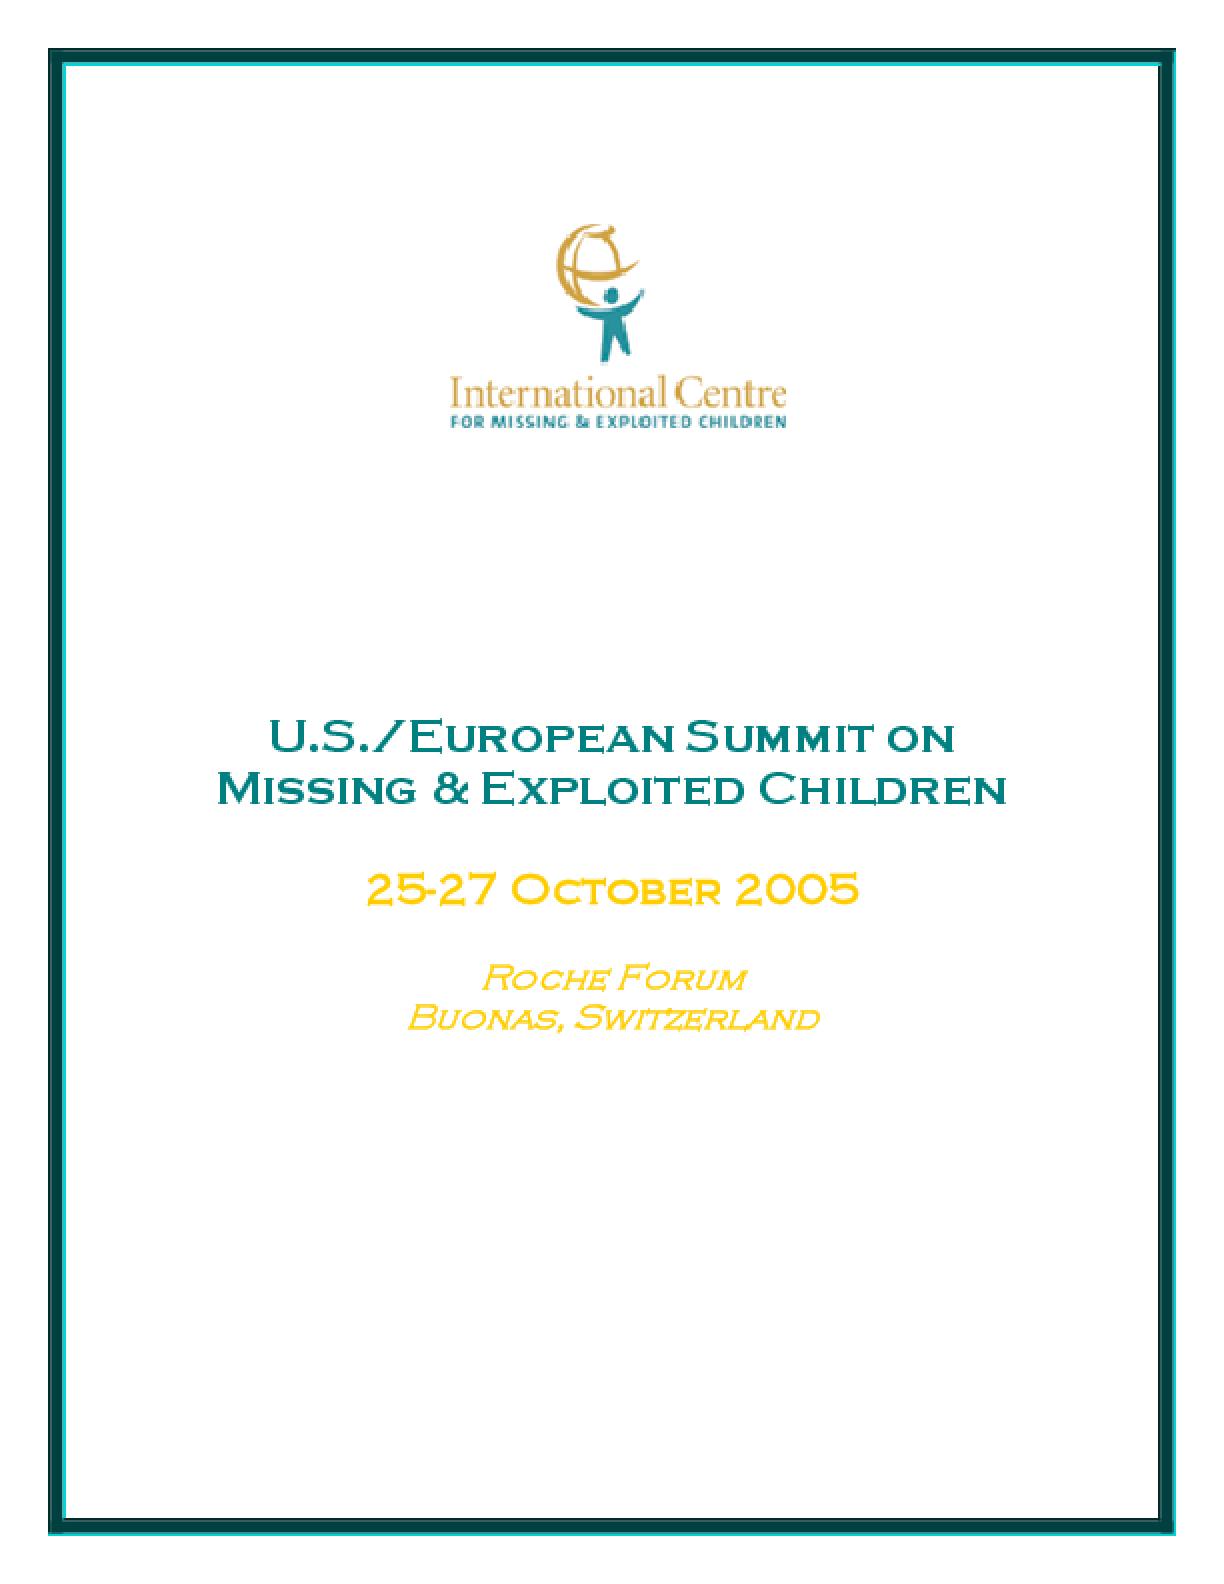 U.S./European Summit on Missing & Exploited Children